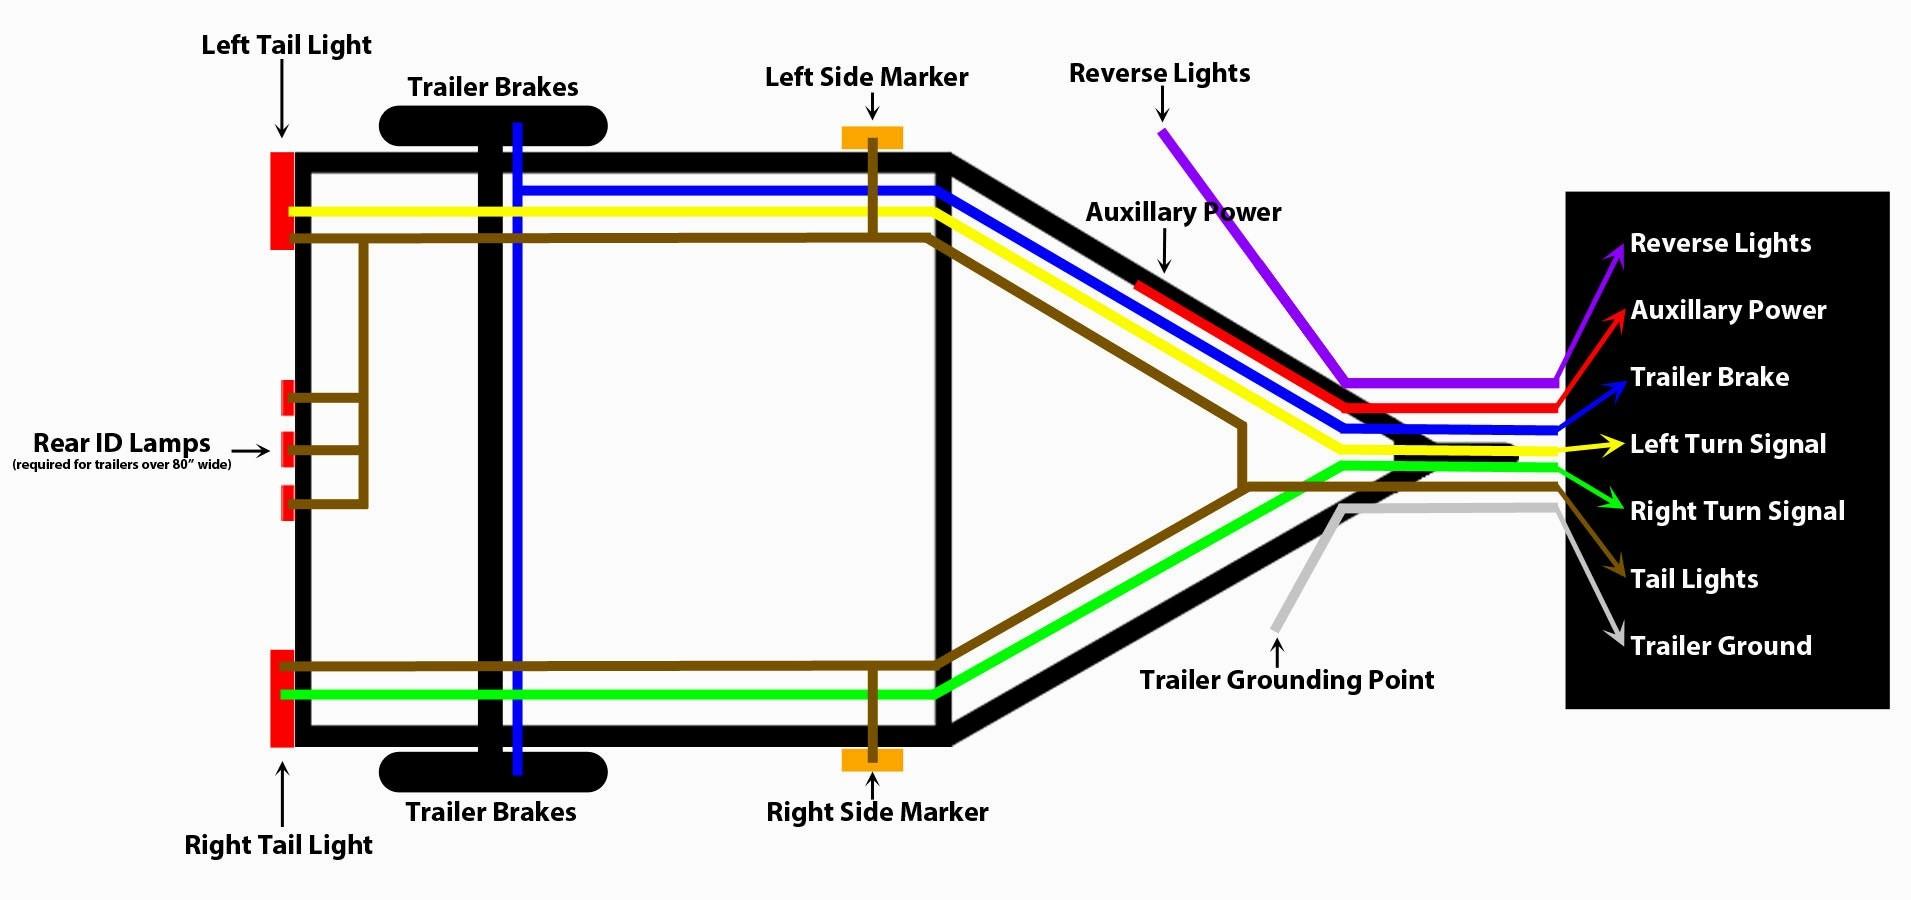 HX_2375] Wiring Diagram For Stock Trailer Free Diagram